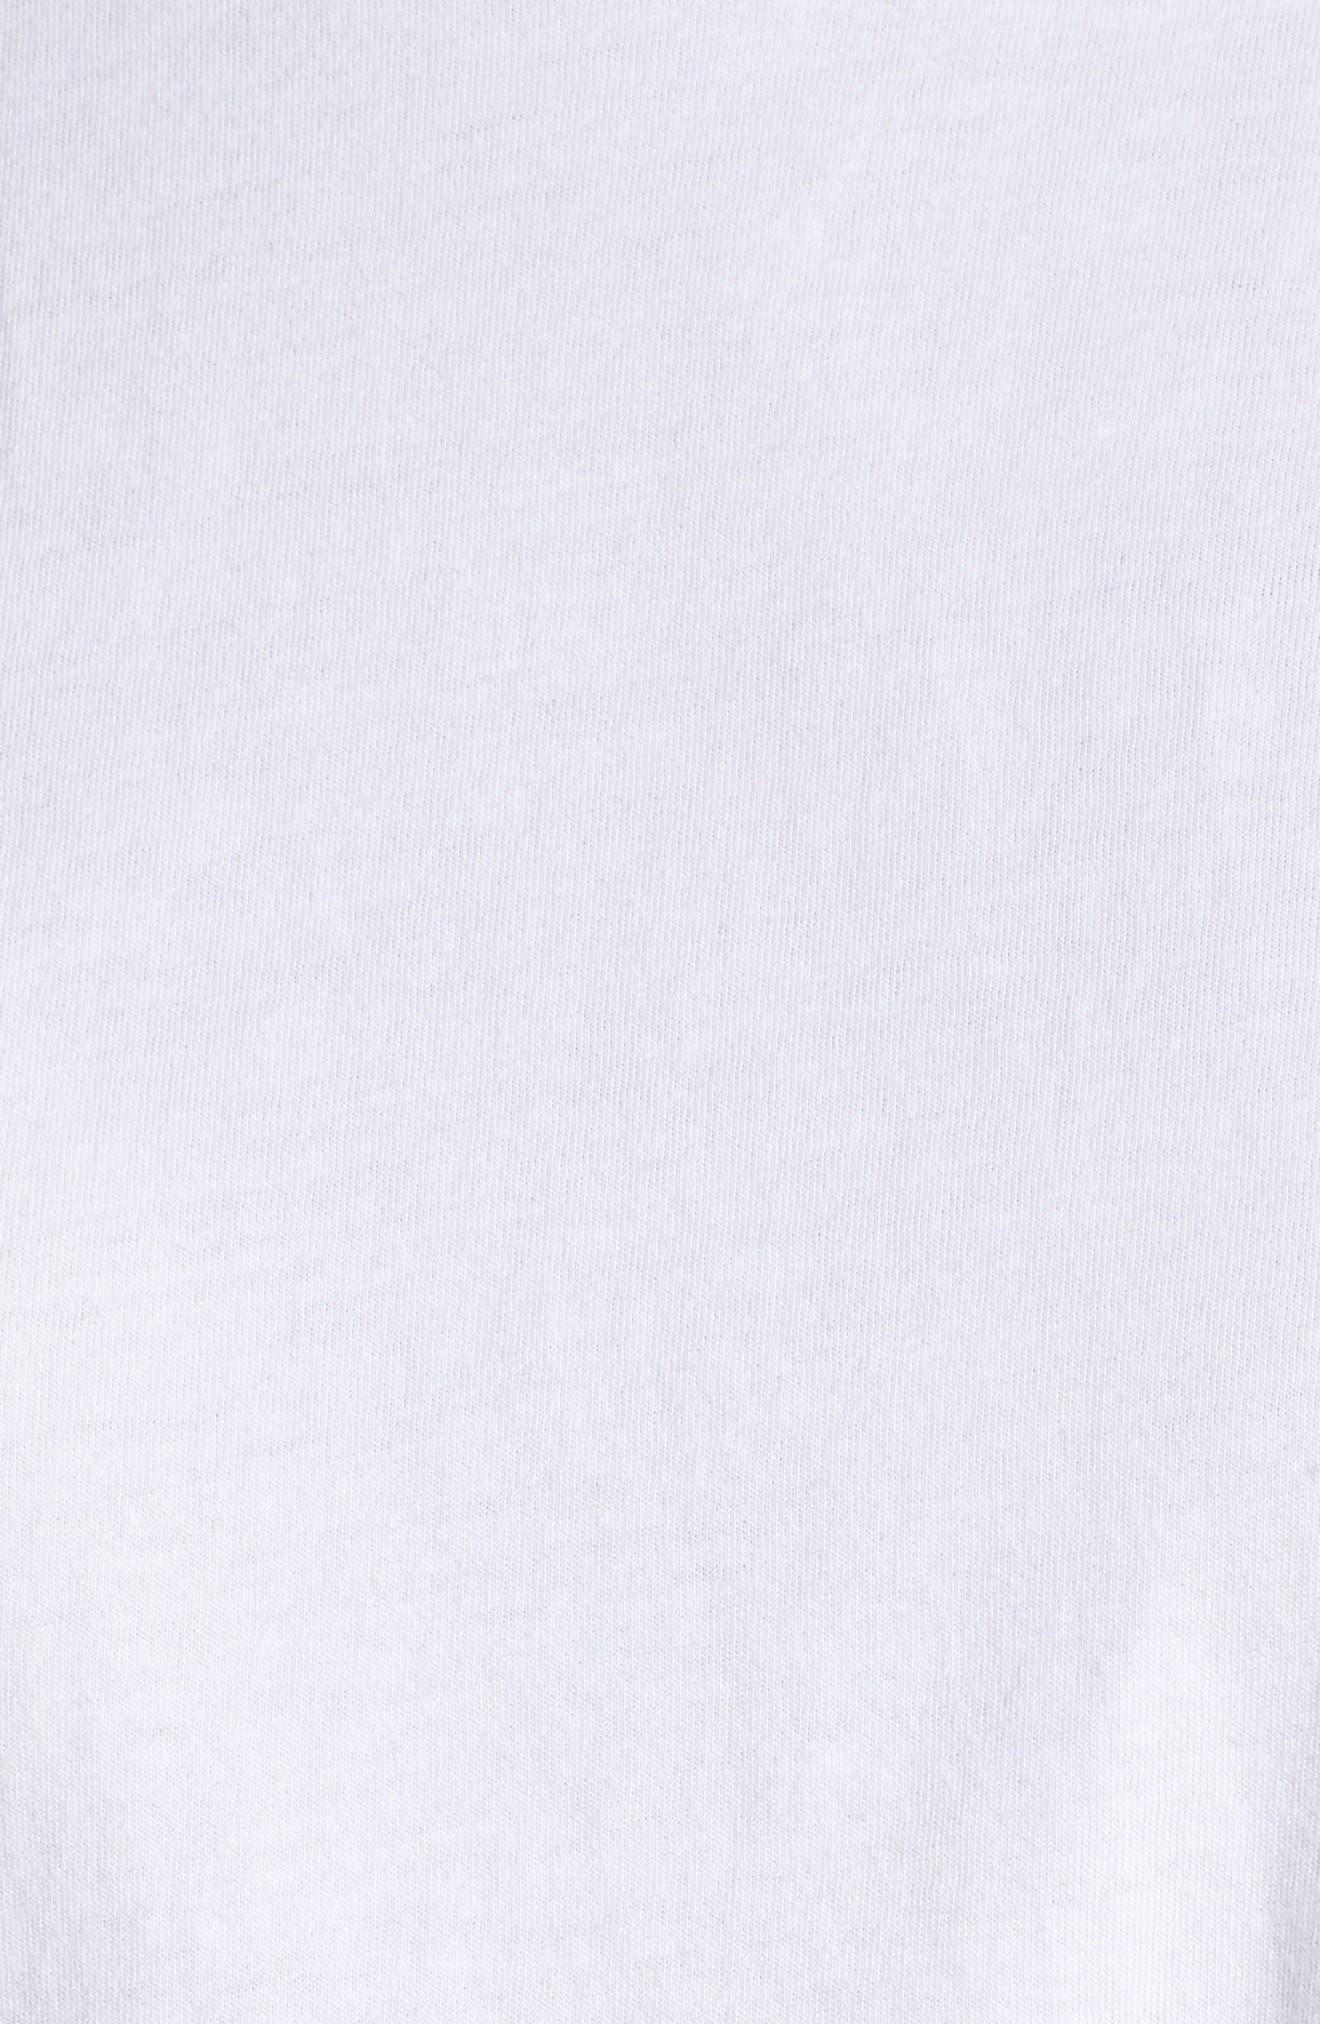 Blonde Lounge Tee,                             Alternate thumbnail 5, color,                             White